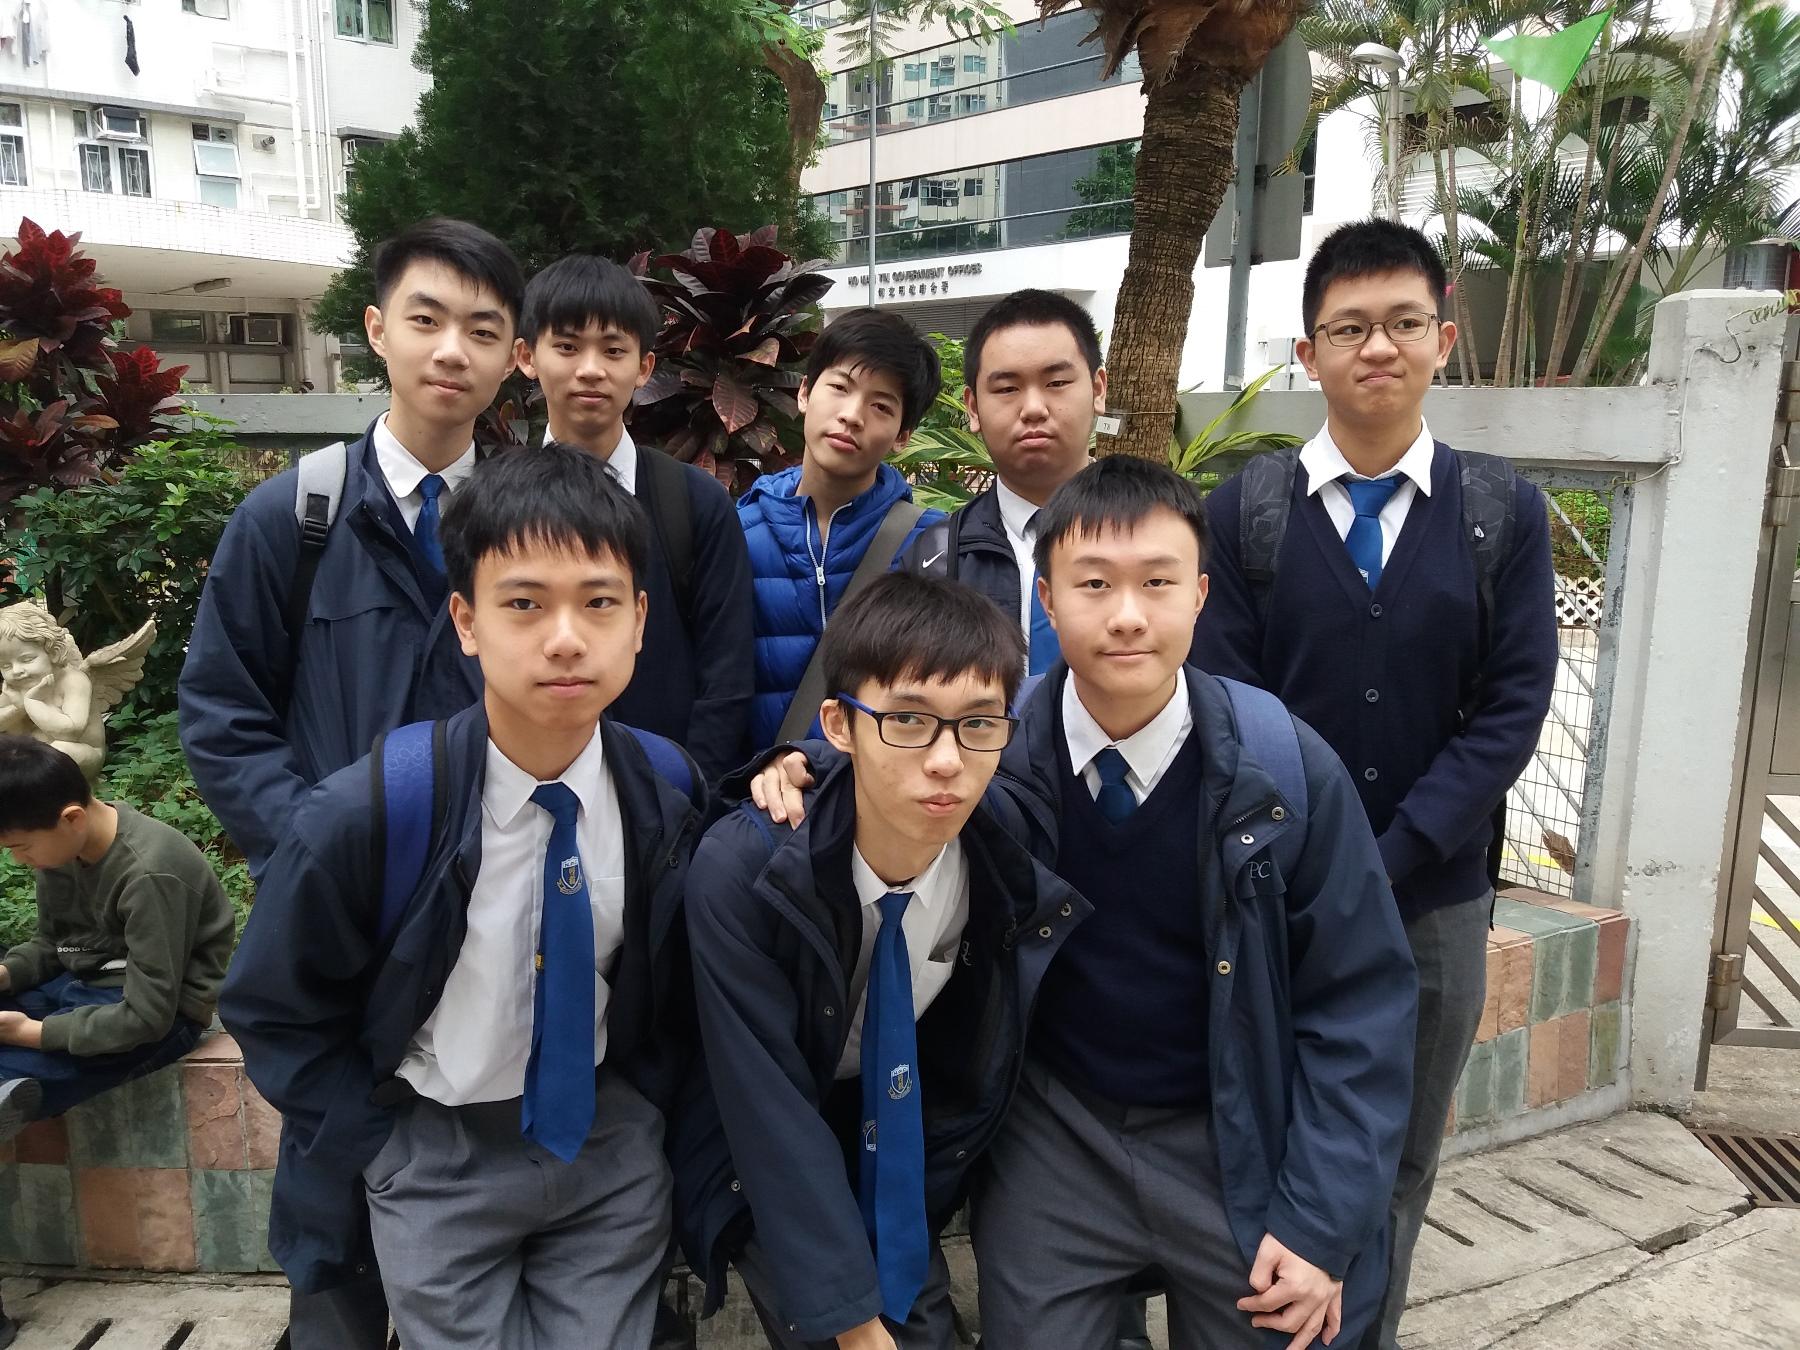 https://www.npc.edu.hk/sites/default/files/20191215_105119.jpg